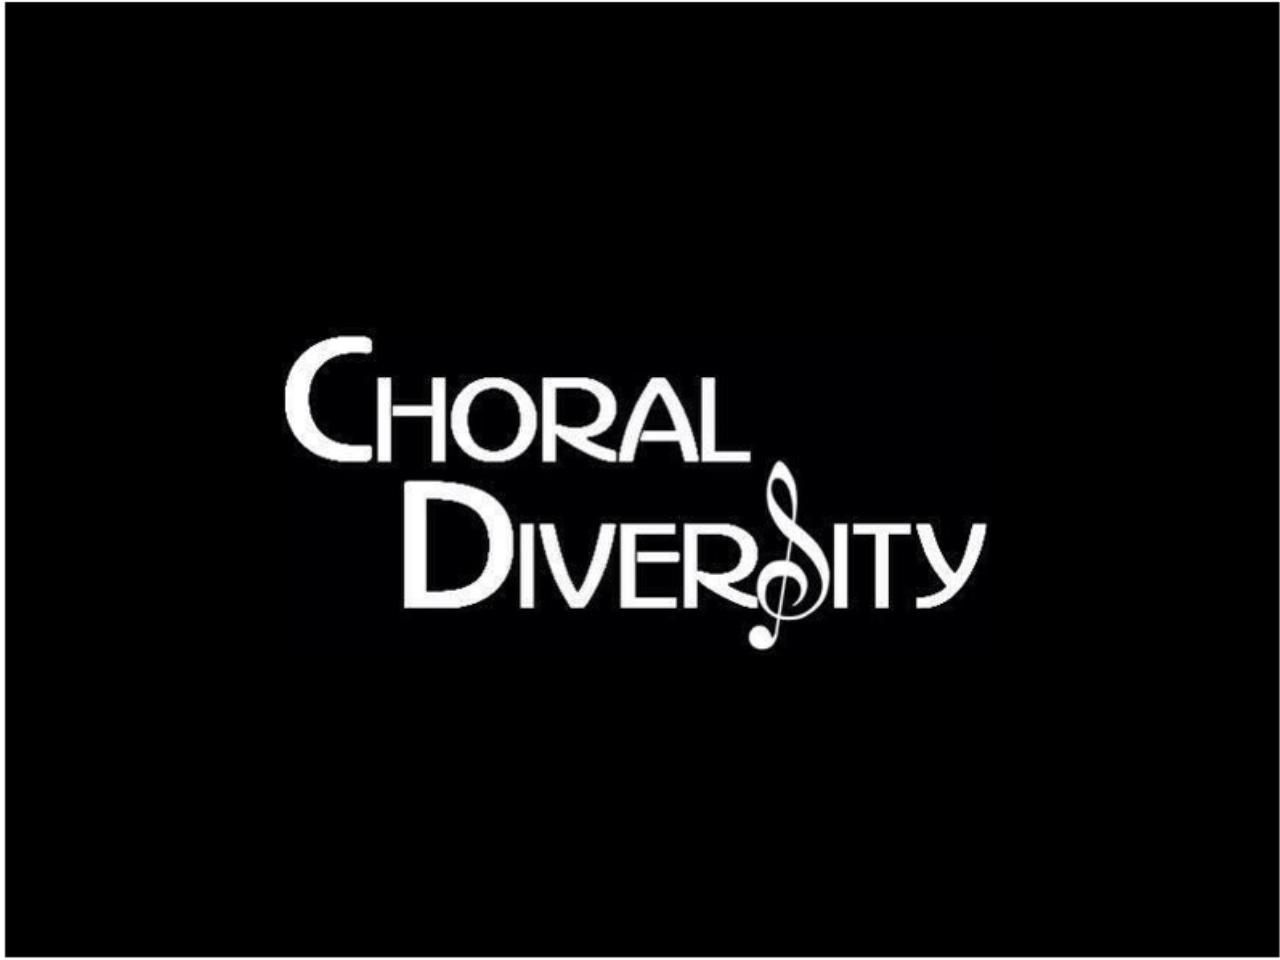 Proud Sponsors of Choral Diversity